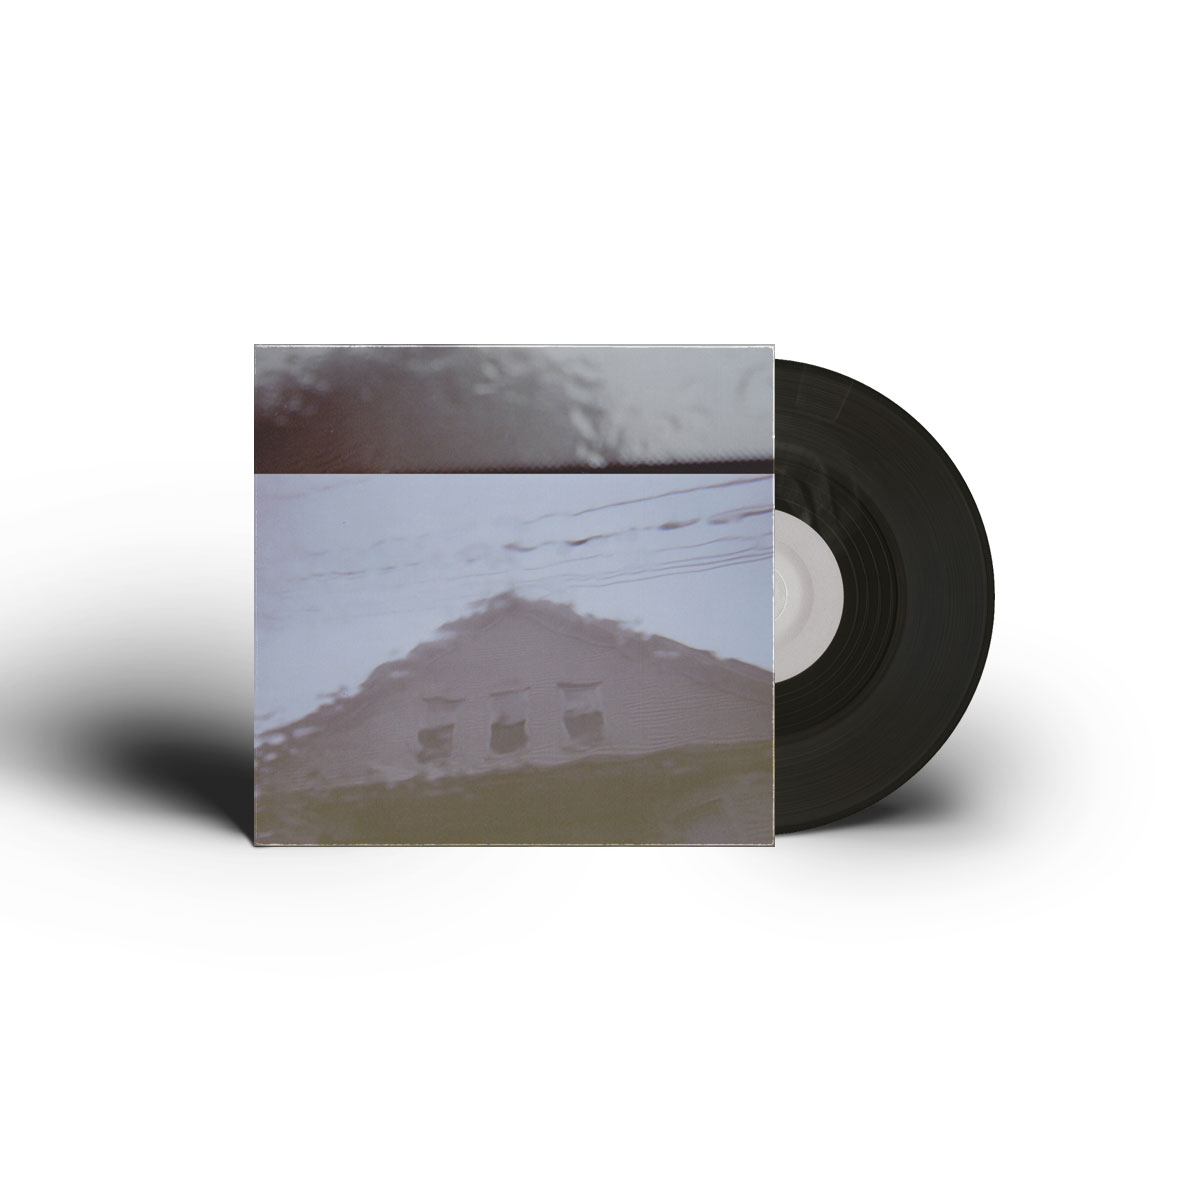 Settler - Dissociation Songs (In the Key of F) [7